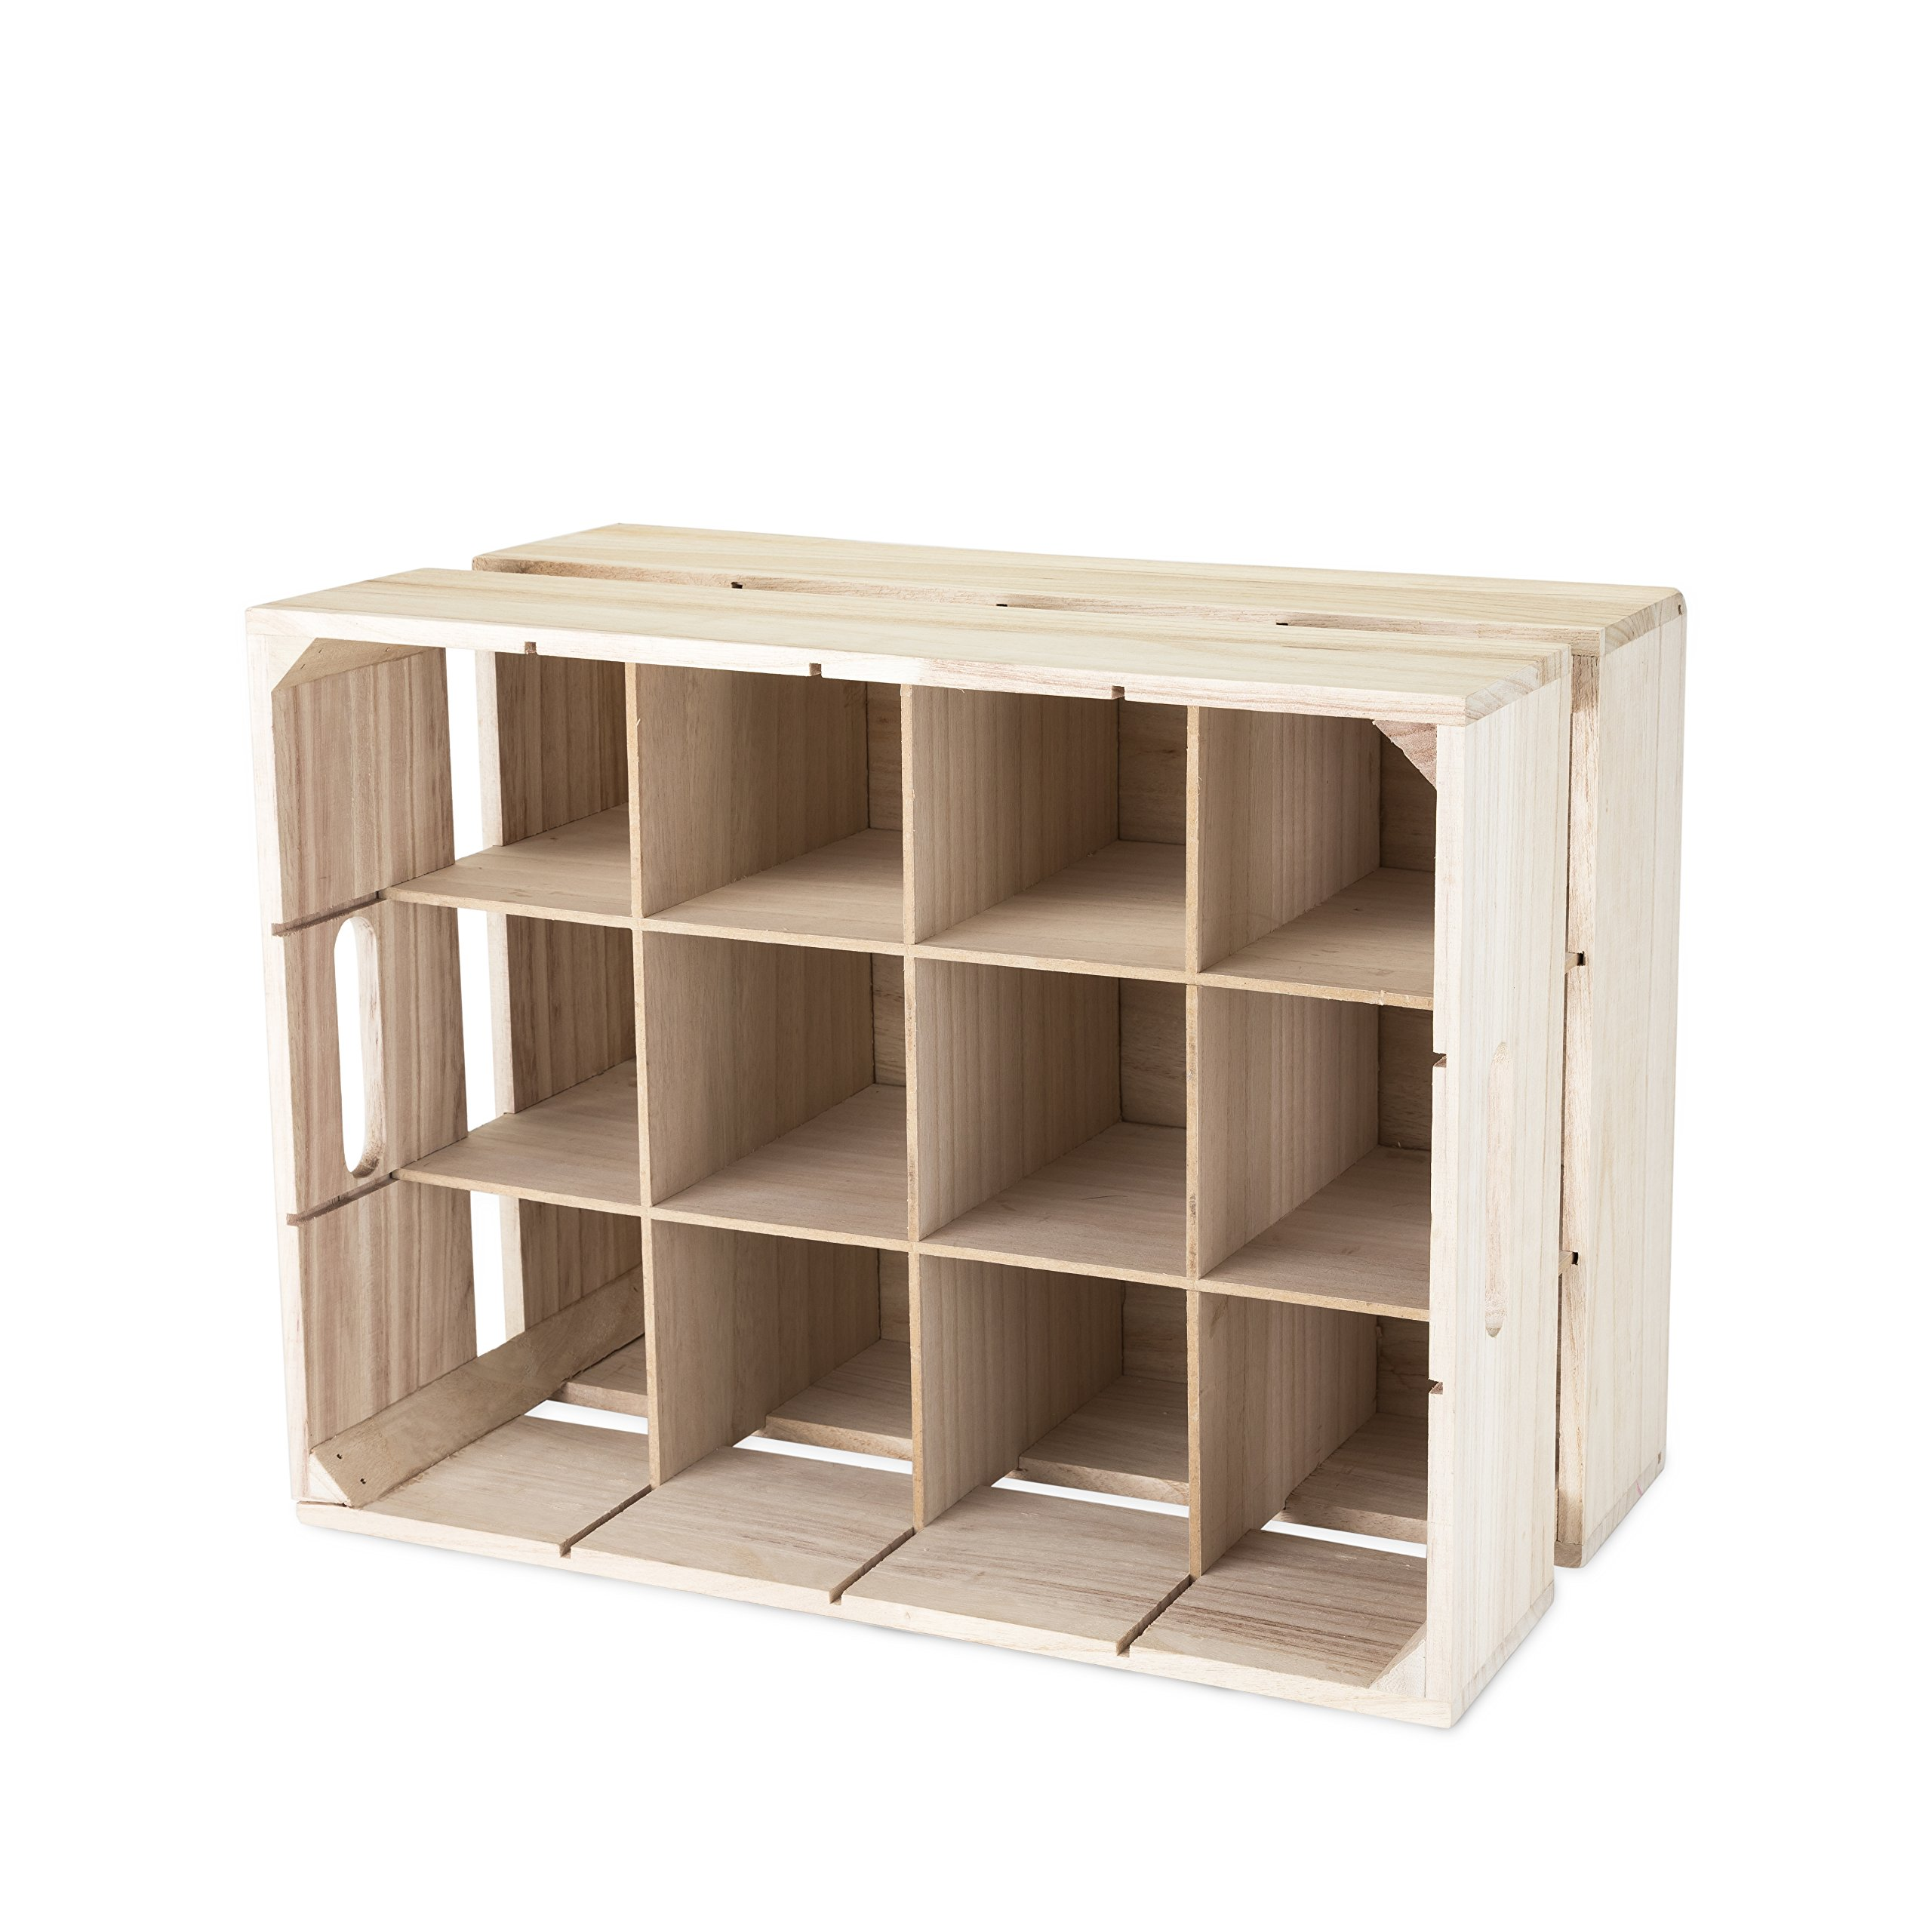 True Fabrication 5283 Wooden Crate Wine Rack, Multicolor